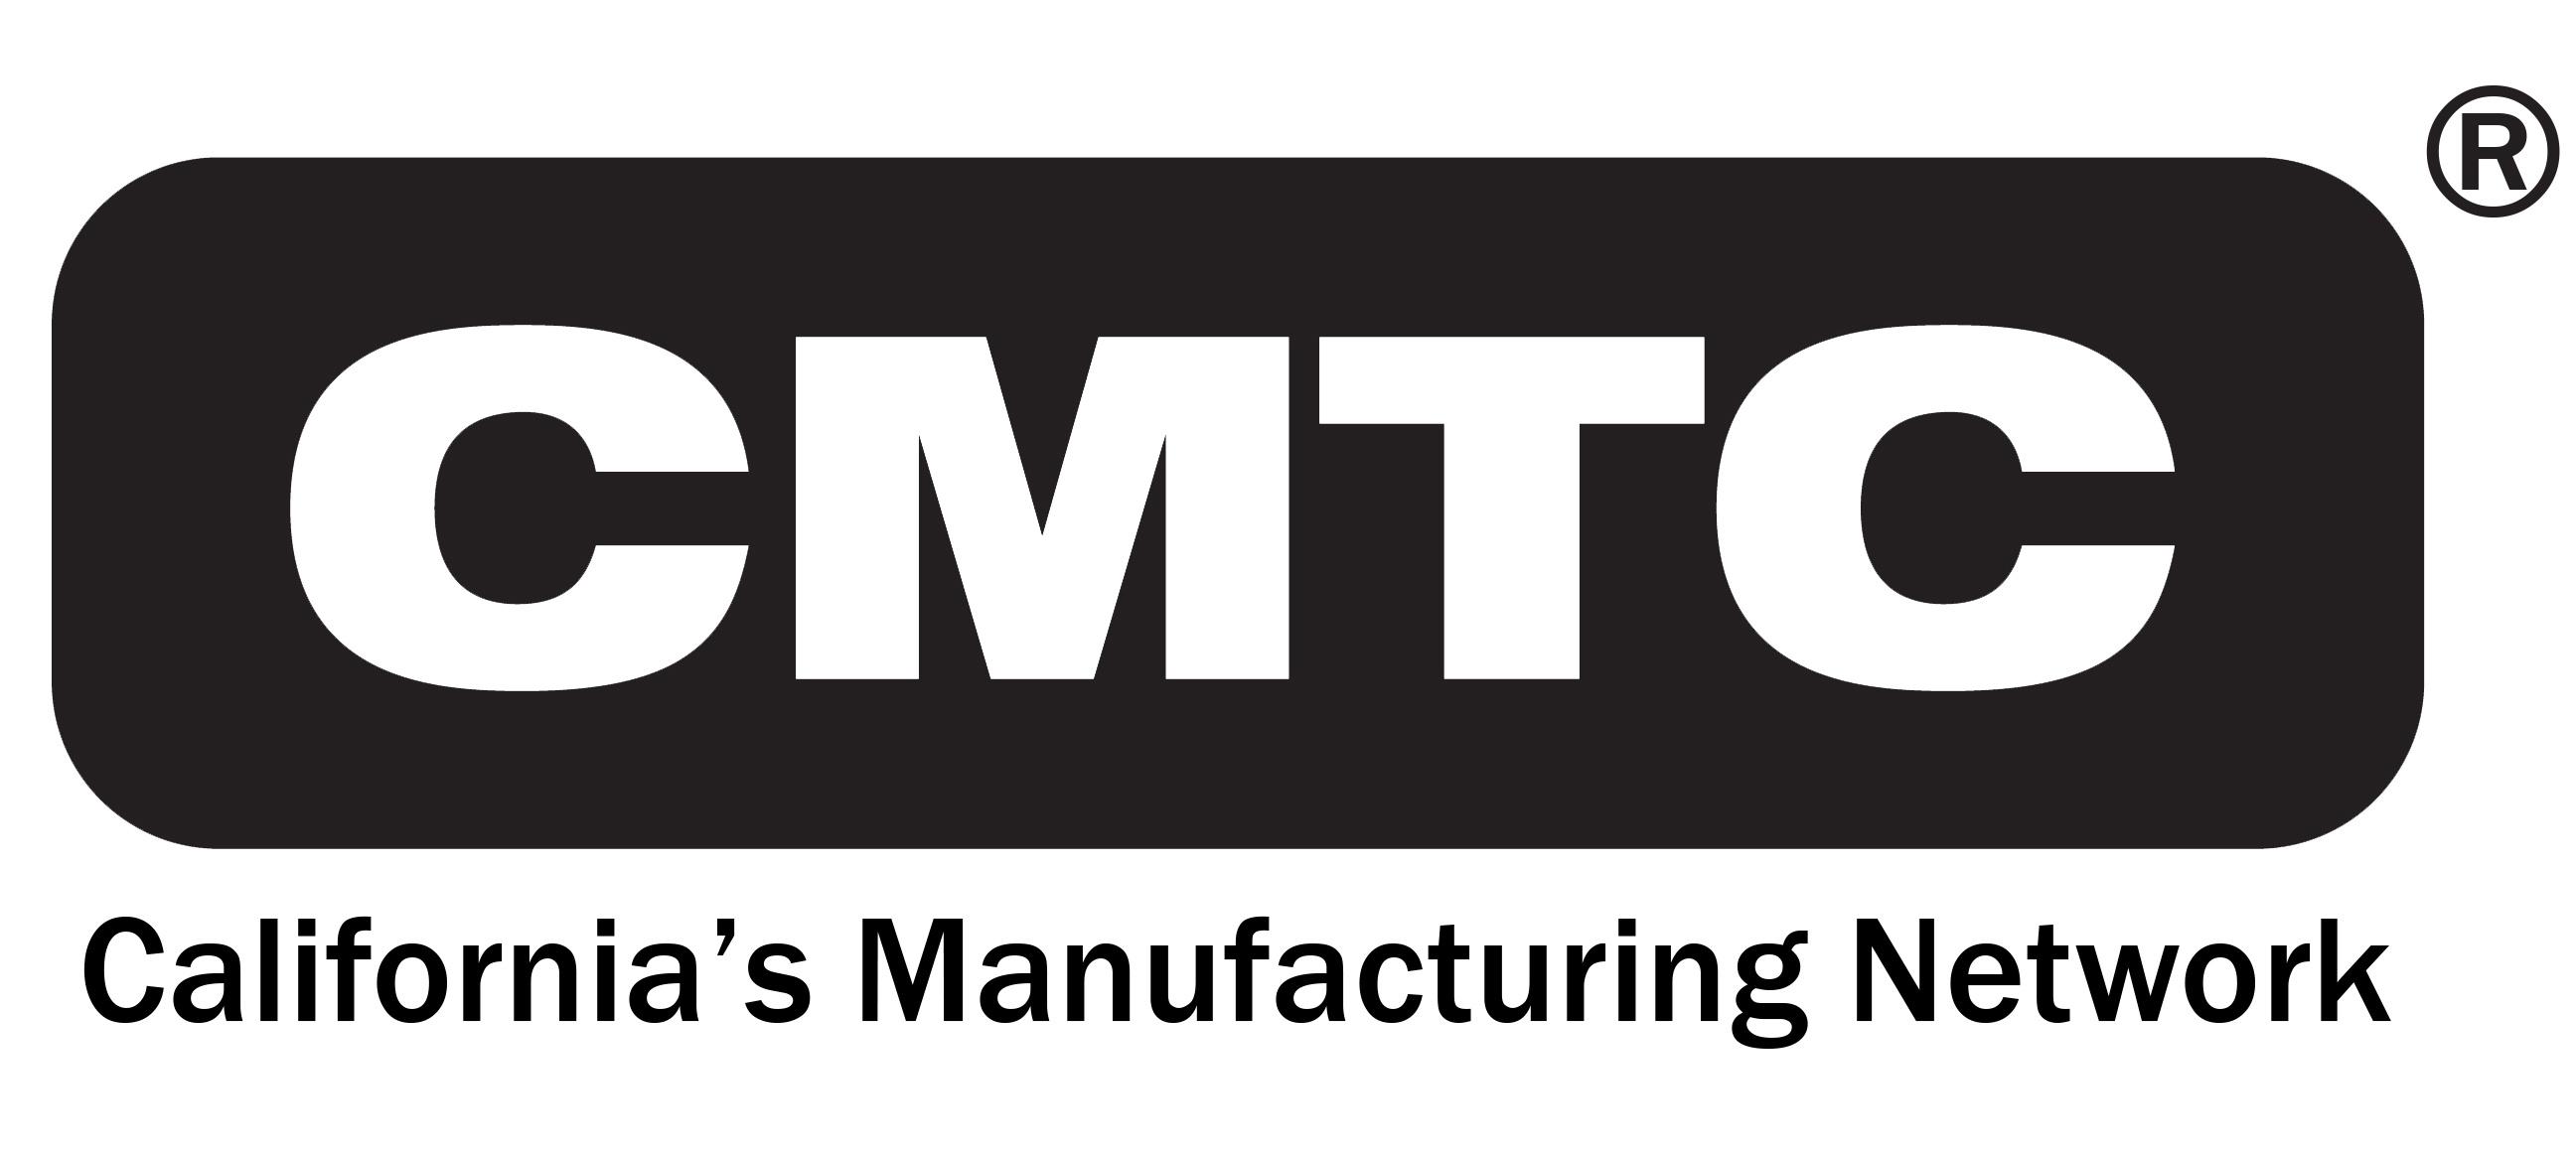 CMTC - California's Manufacturing Network